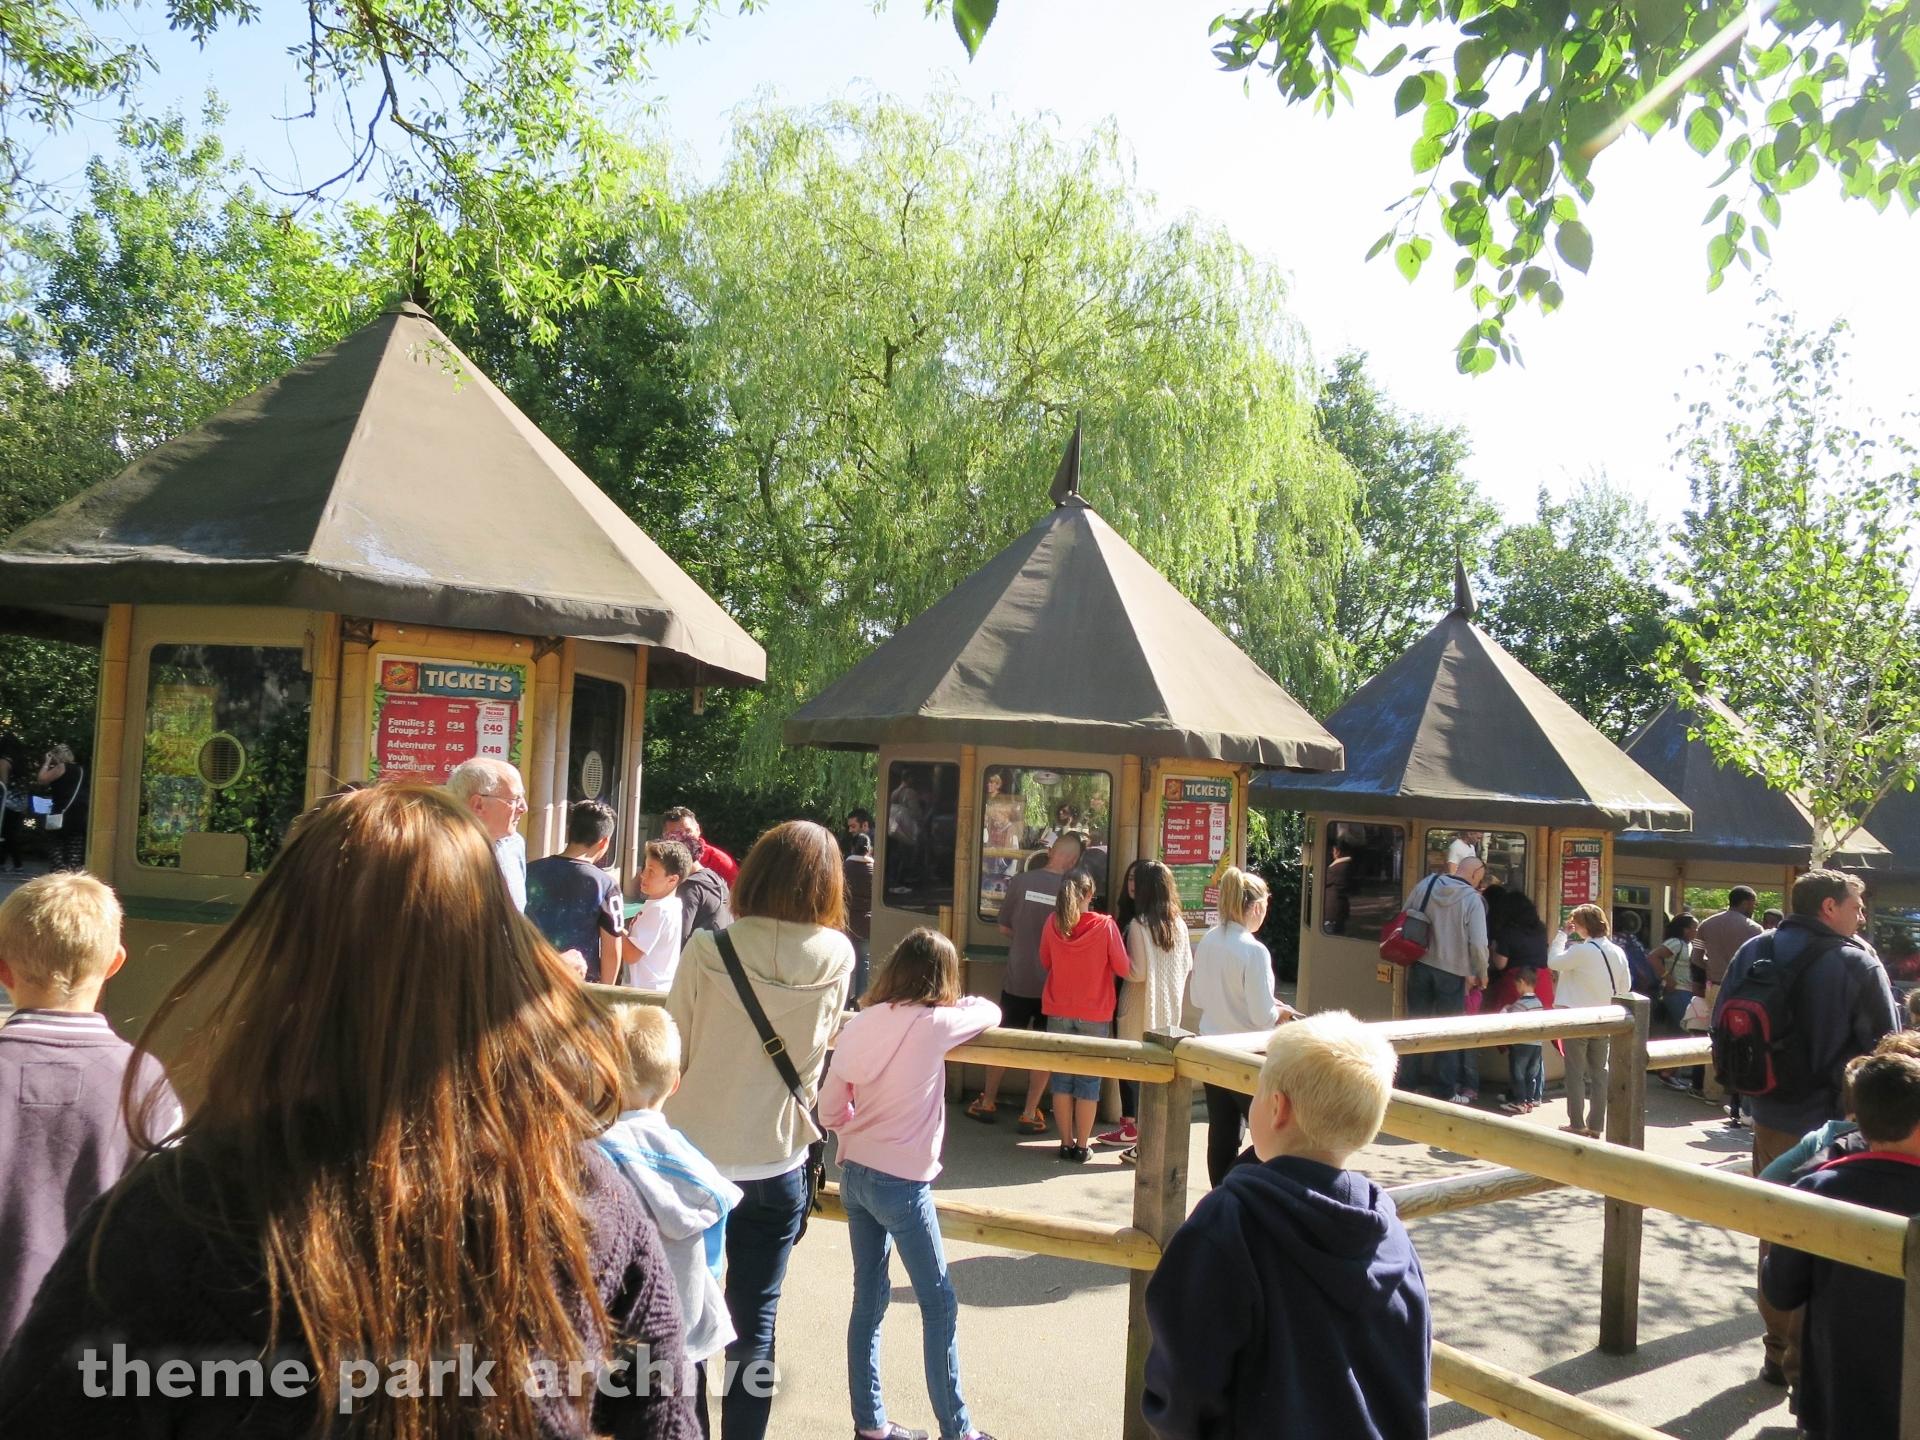 Explorer Gate at Chessington World of Adventures Resort